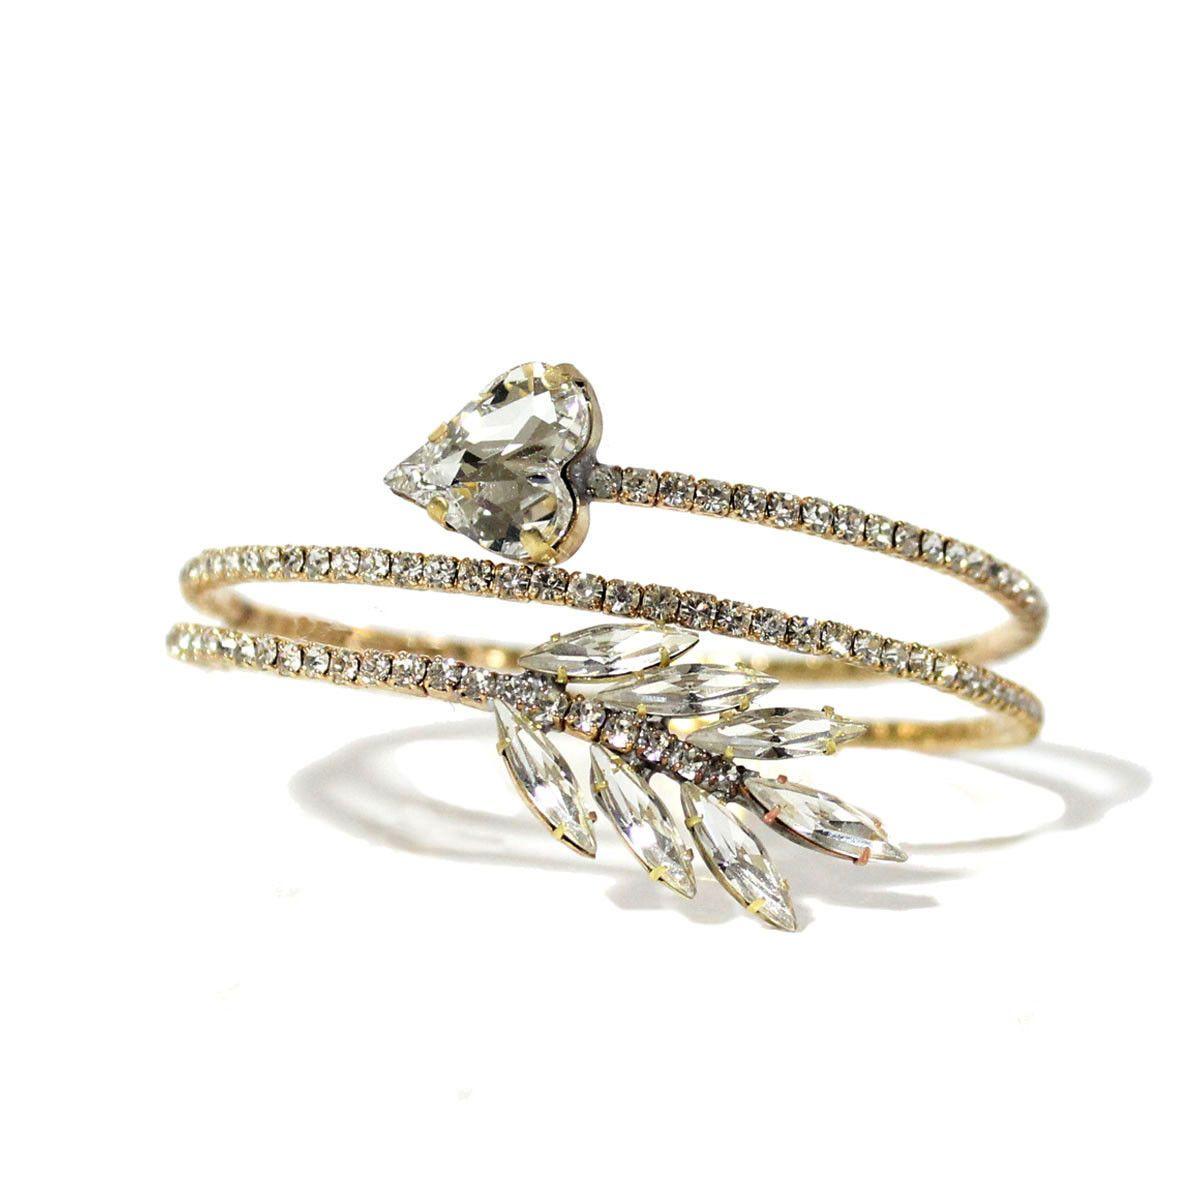 I Adore You #bracelet #cuff #cupid #forwardtogether #gold #iadoreyou #intentions #kindness #love #newyear #positive #rosegold #silver #strongertogether #swarovski #TiAdoroJewelry #valentine